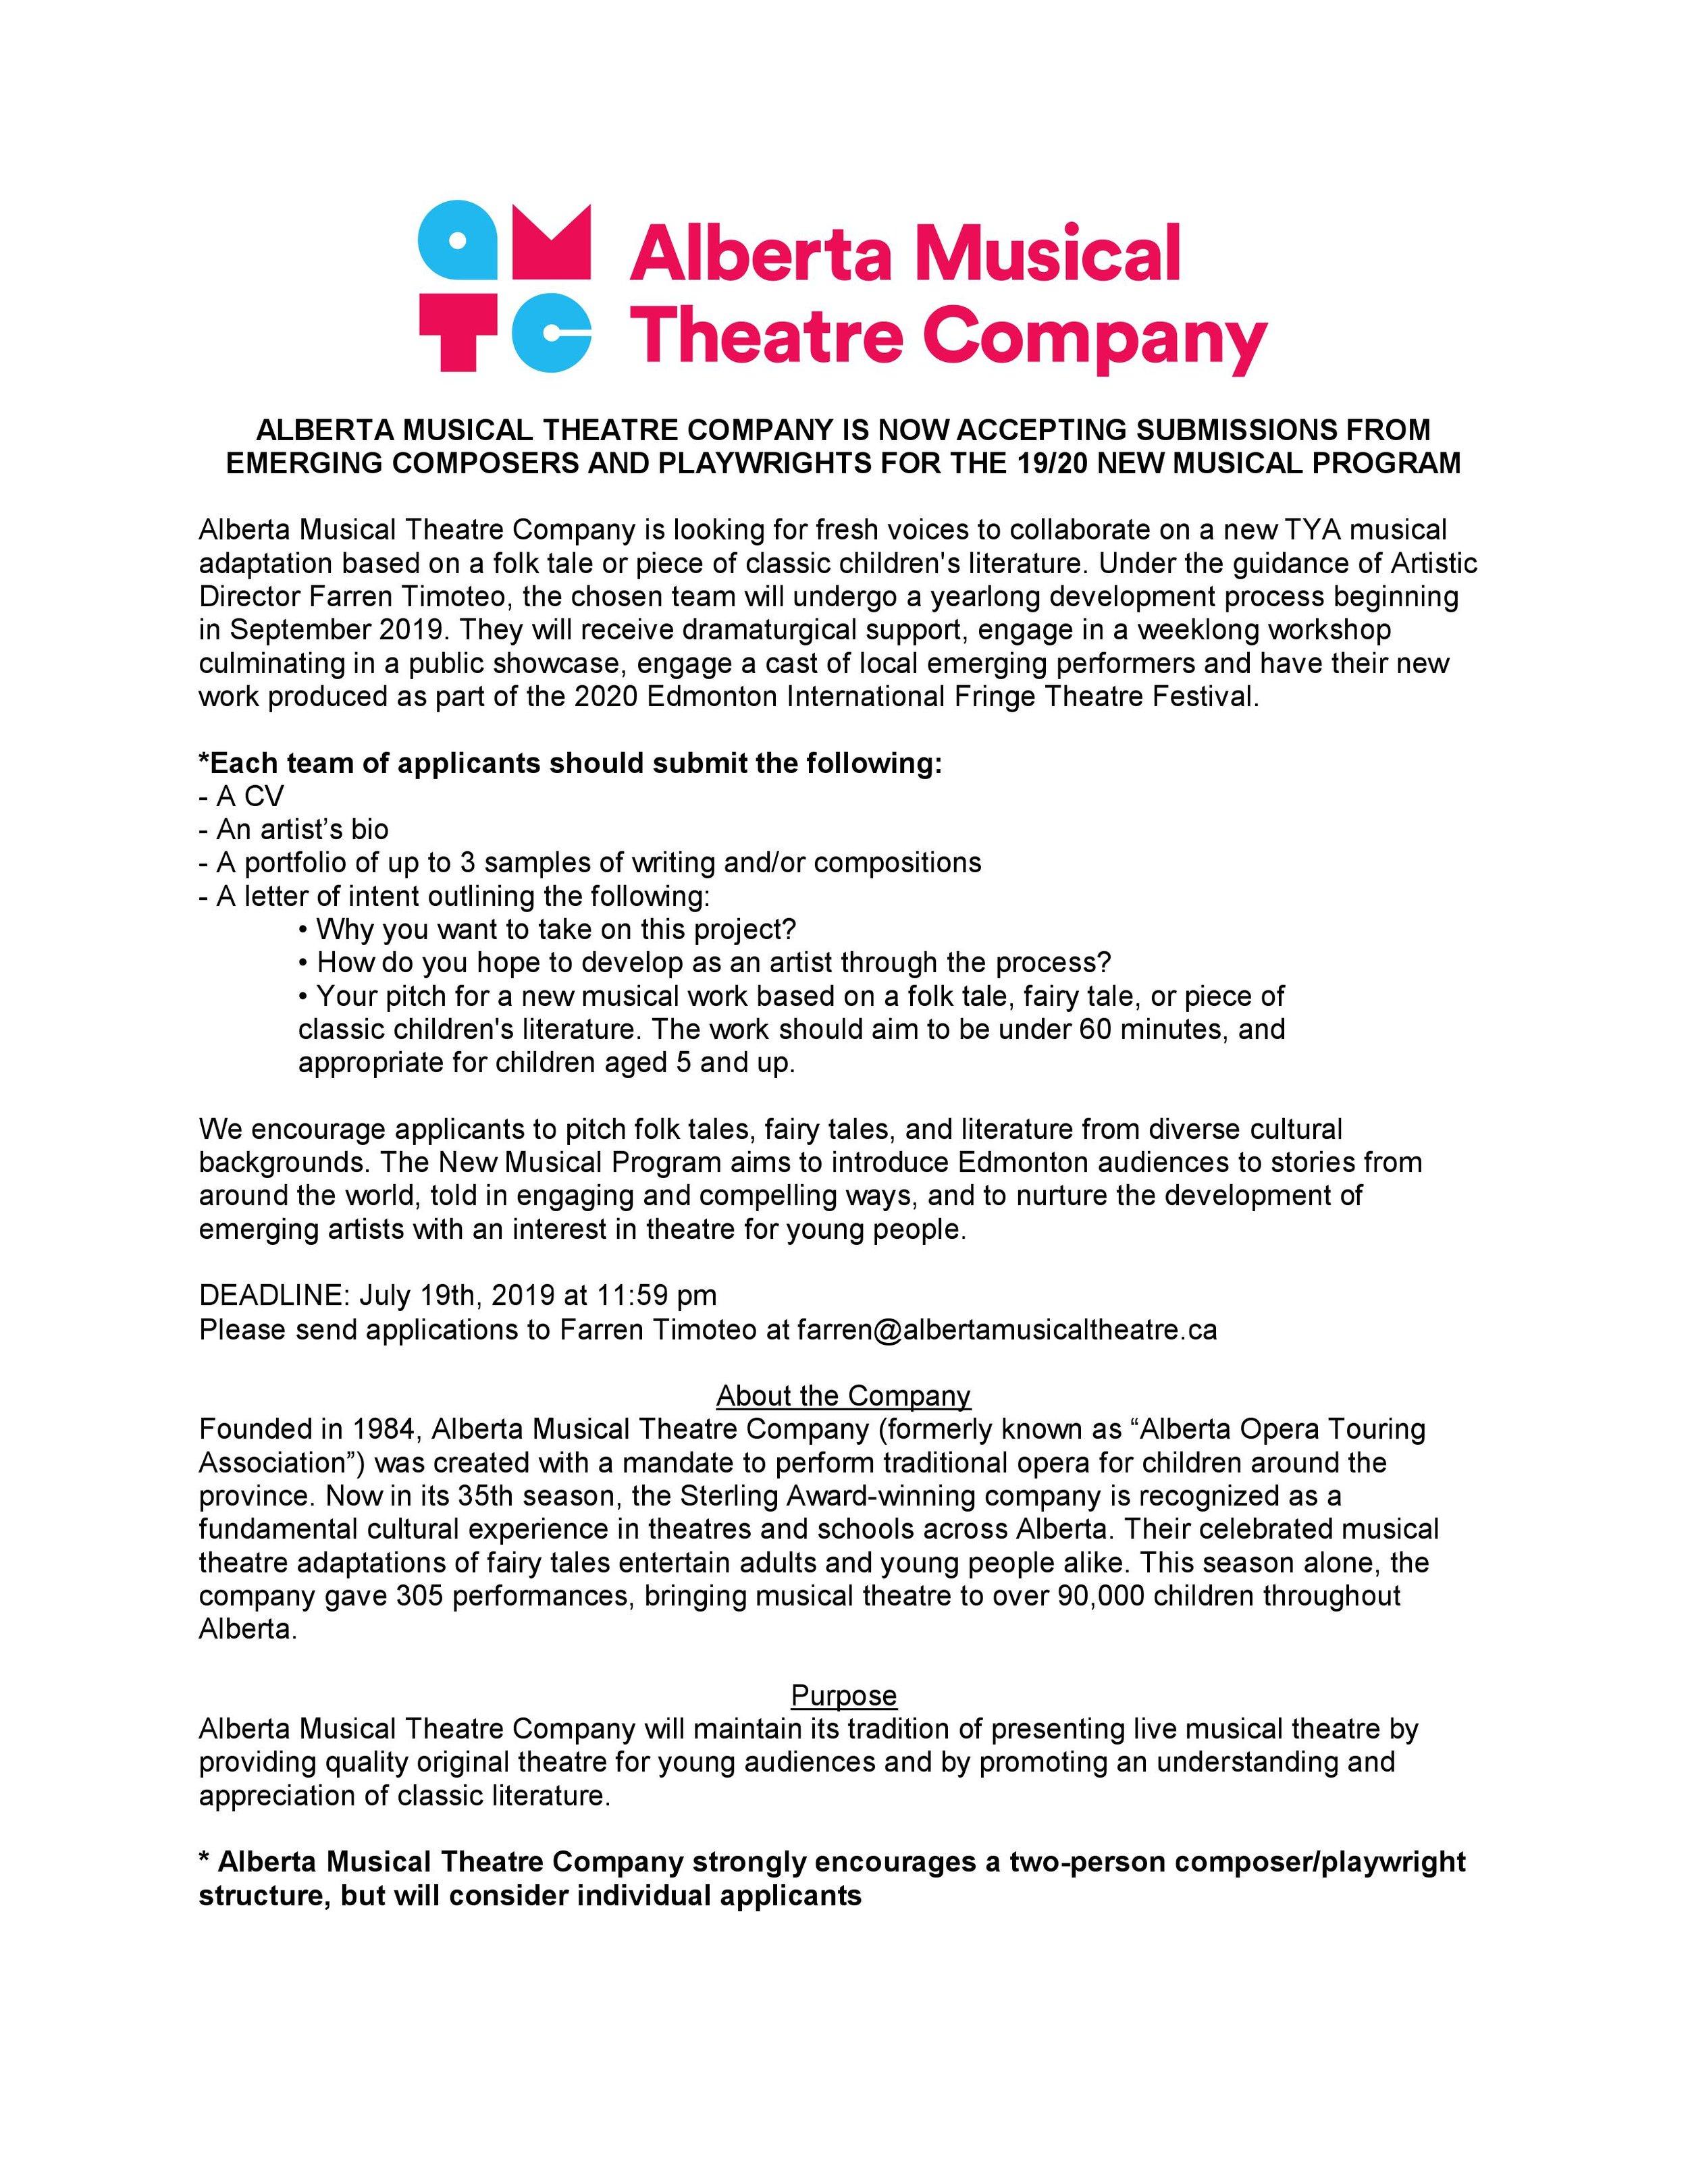 Alberta Opera's Hansel and Gretel